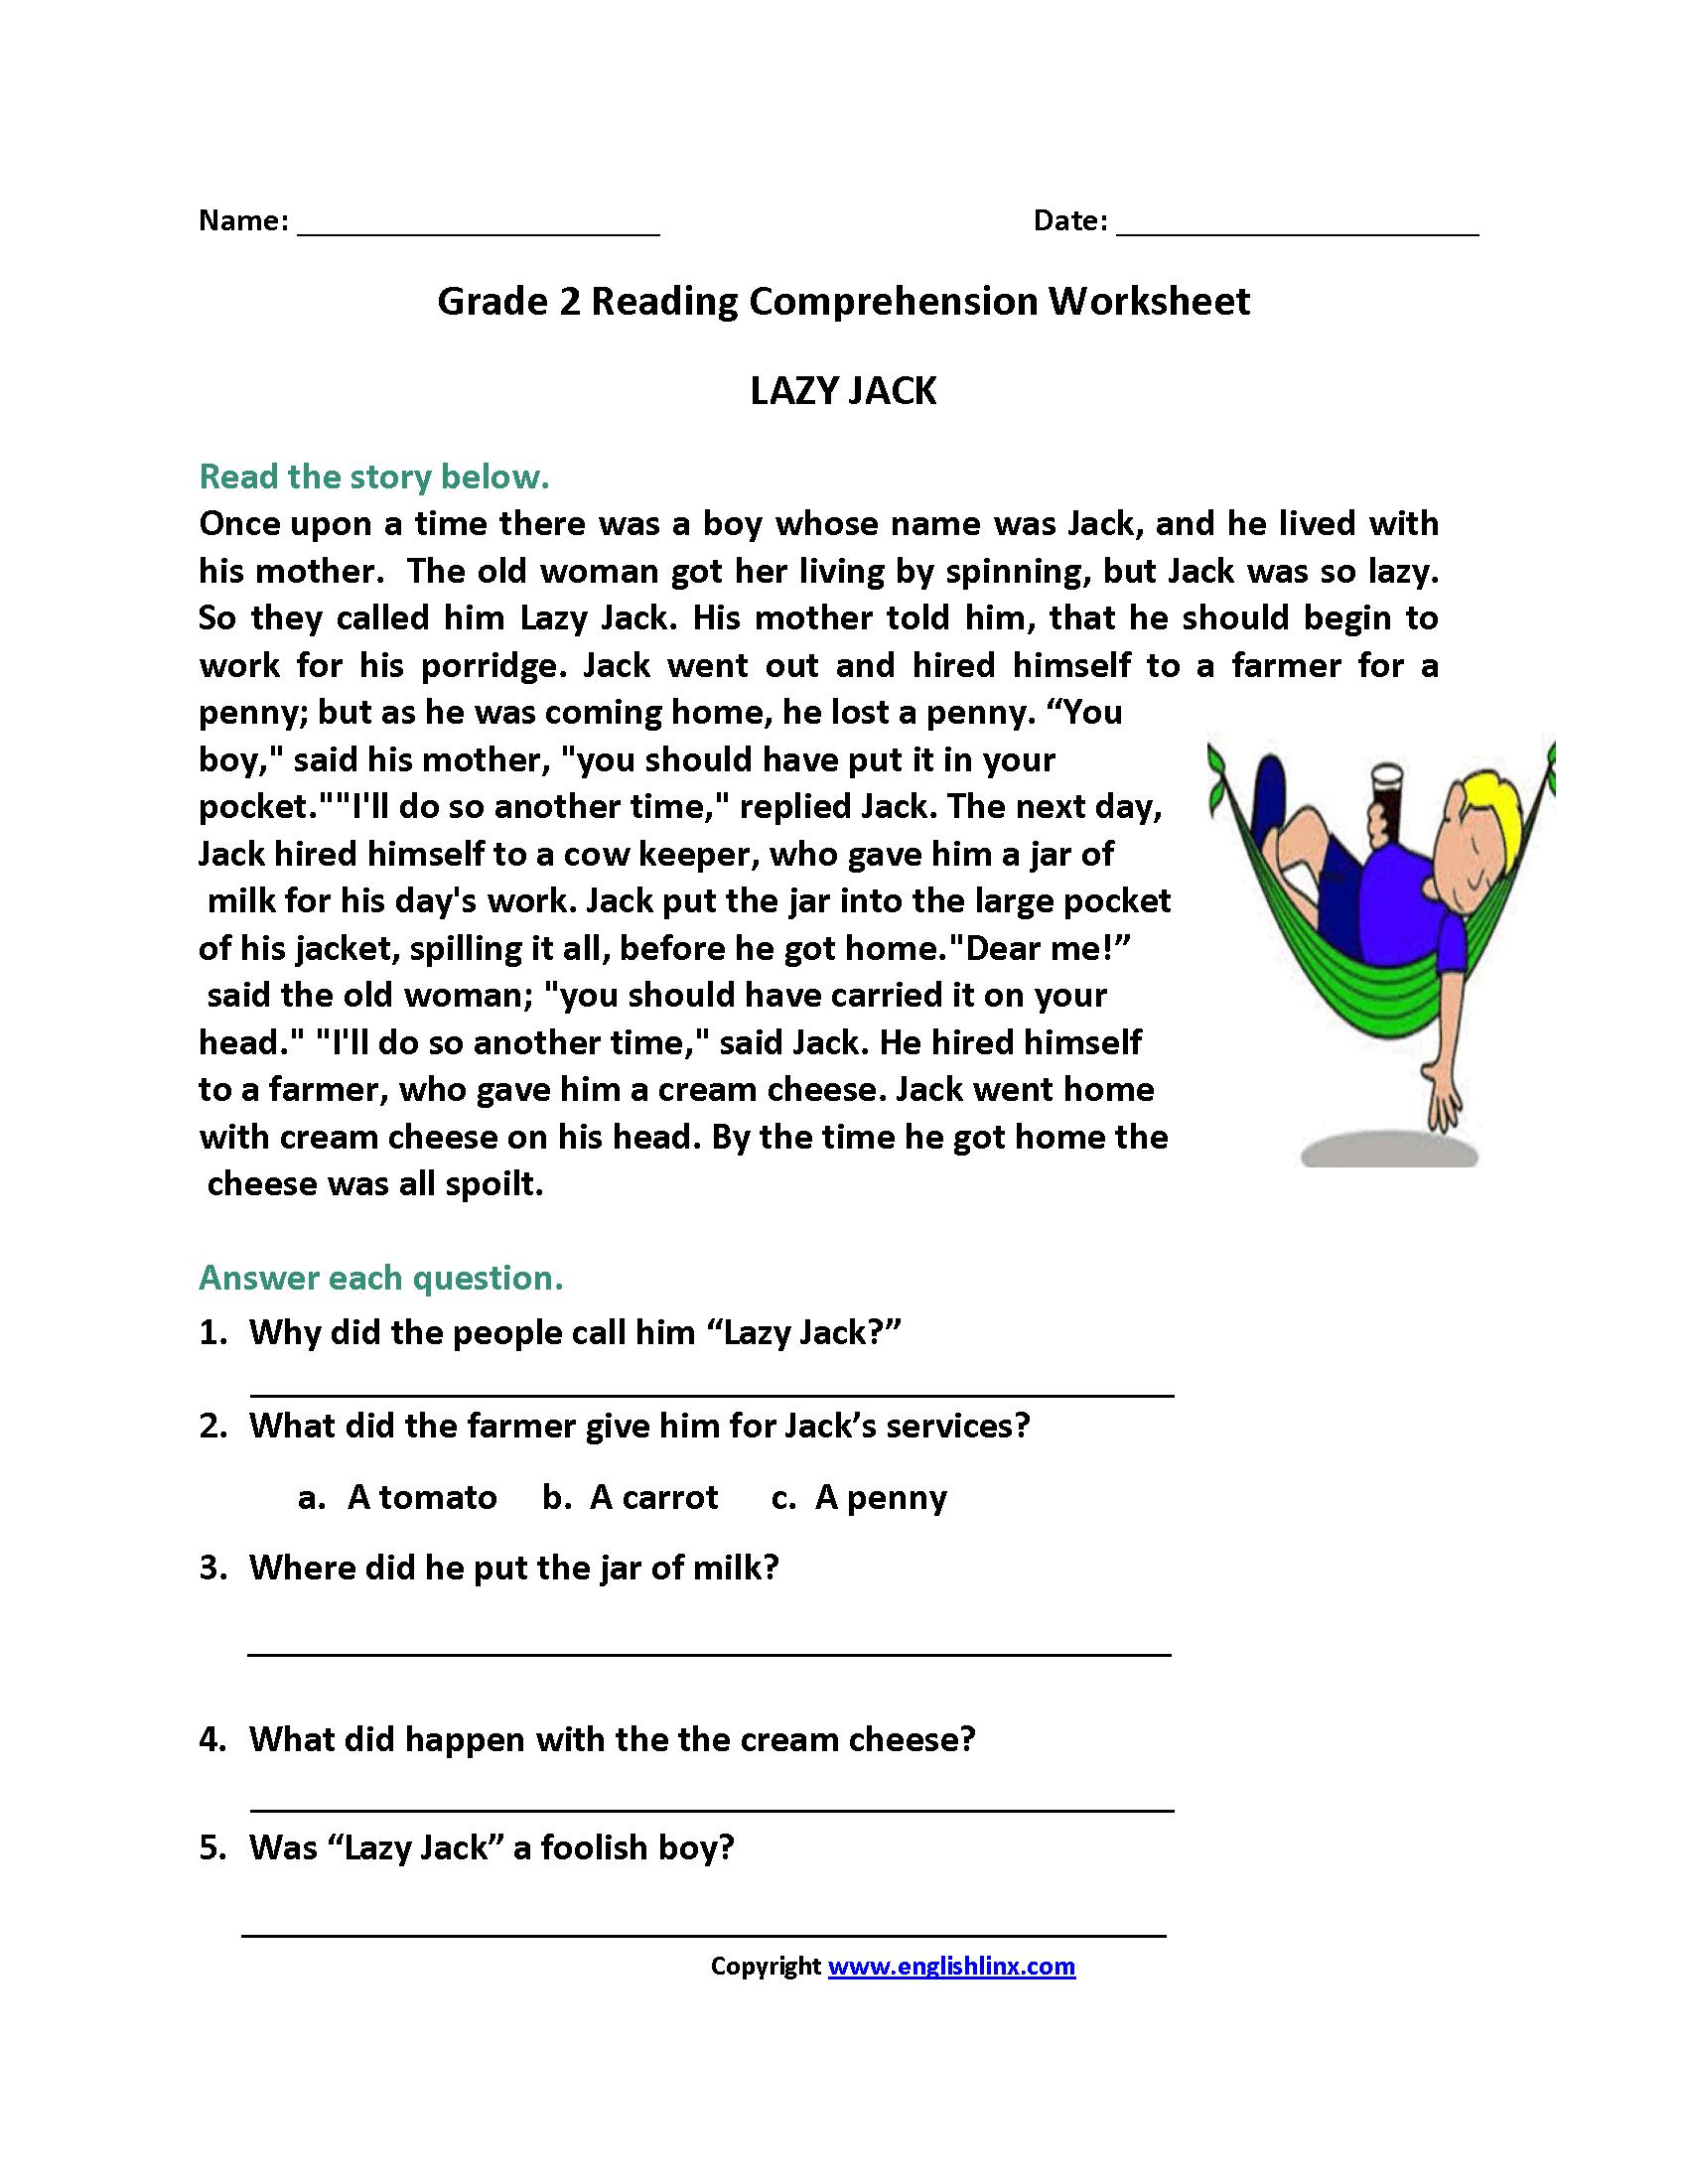 Lazy Jack Second Grade Reading Worksheets